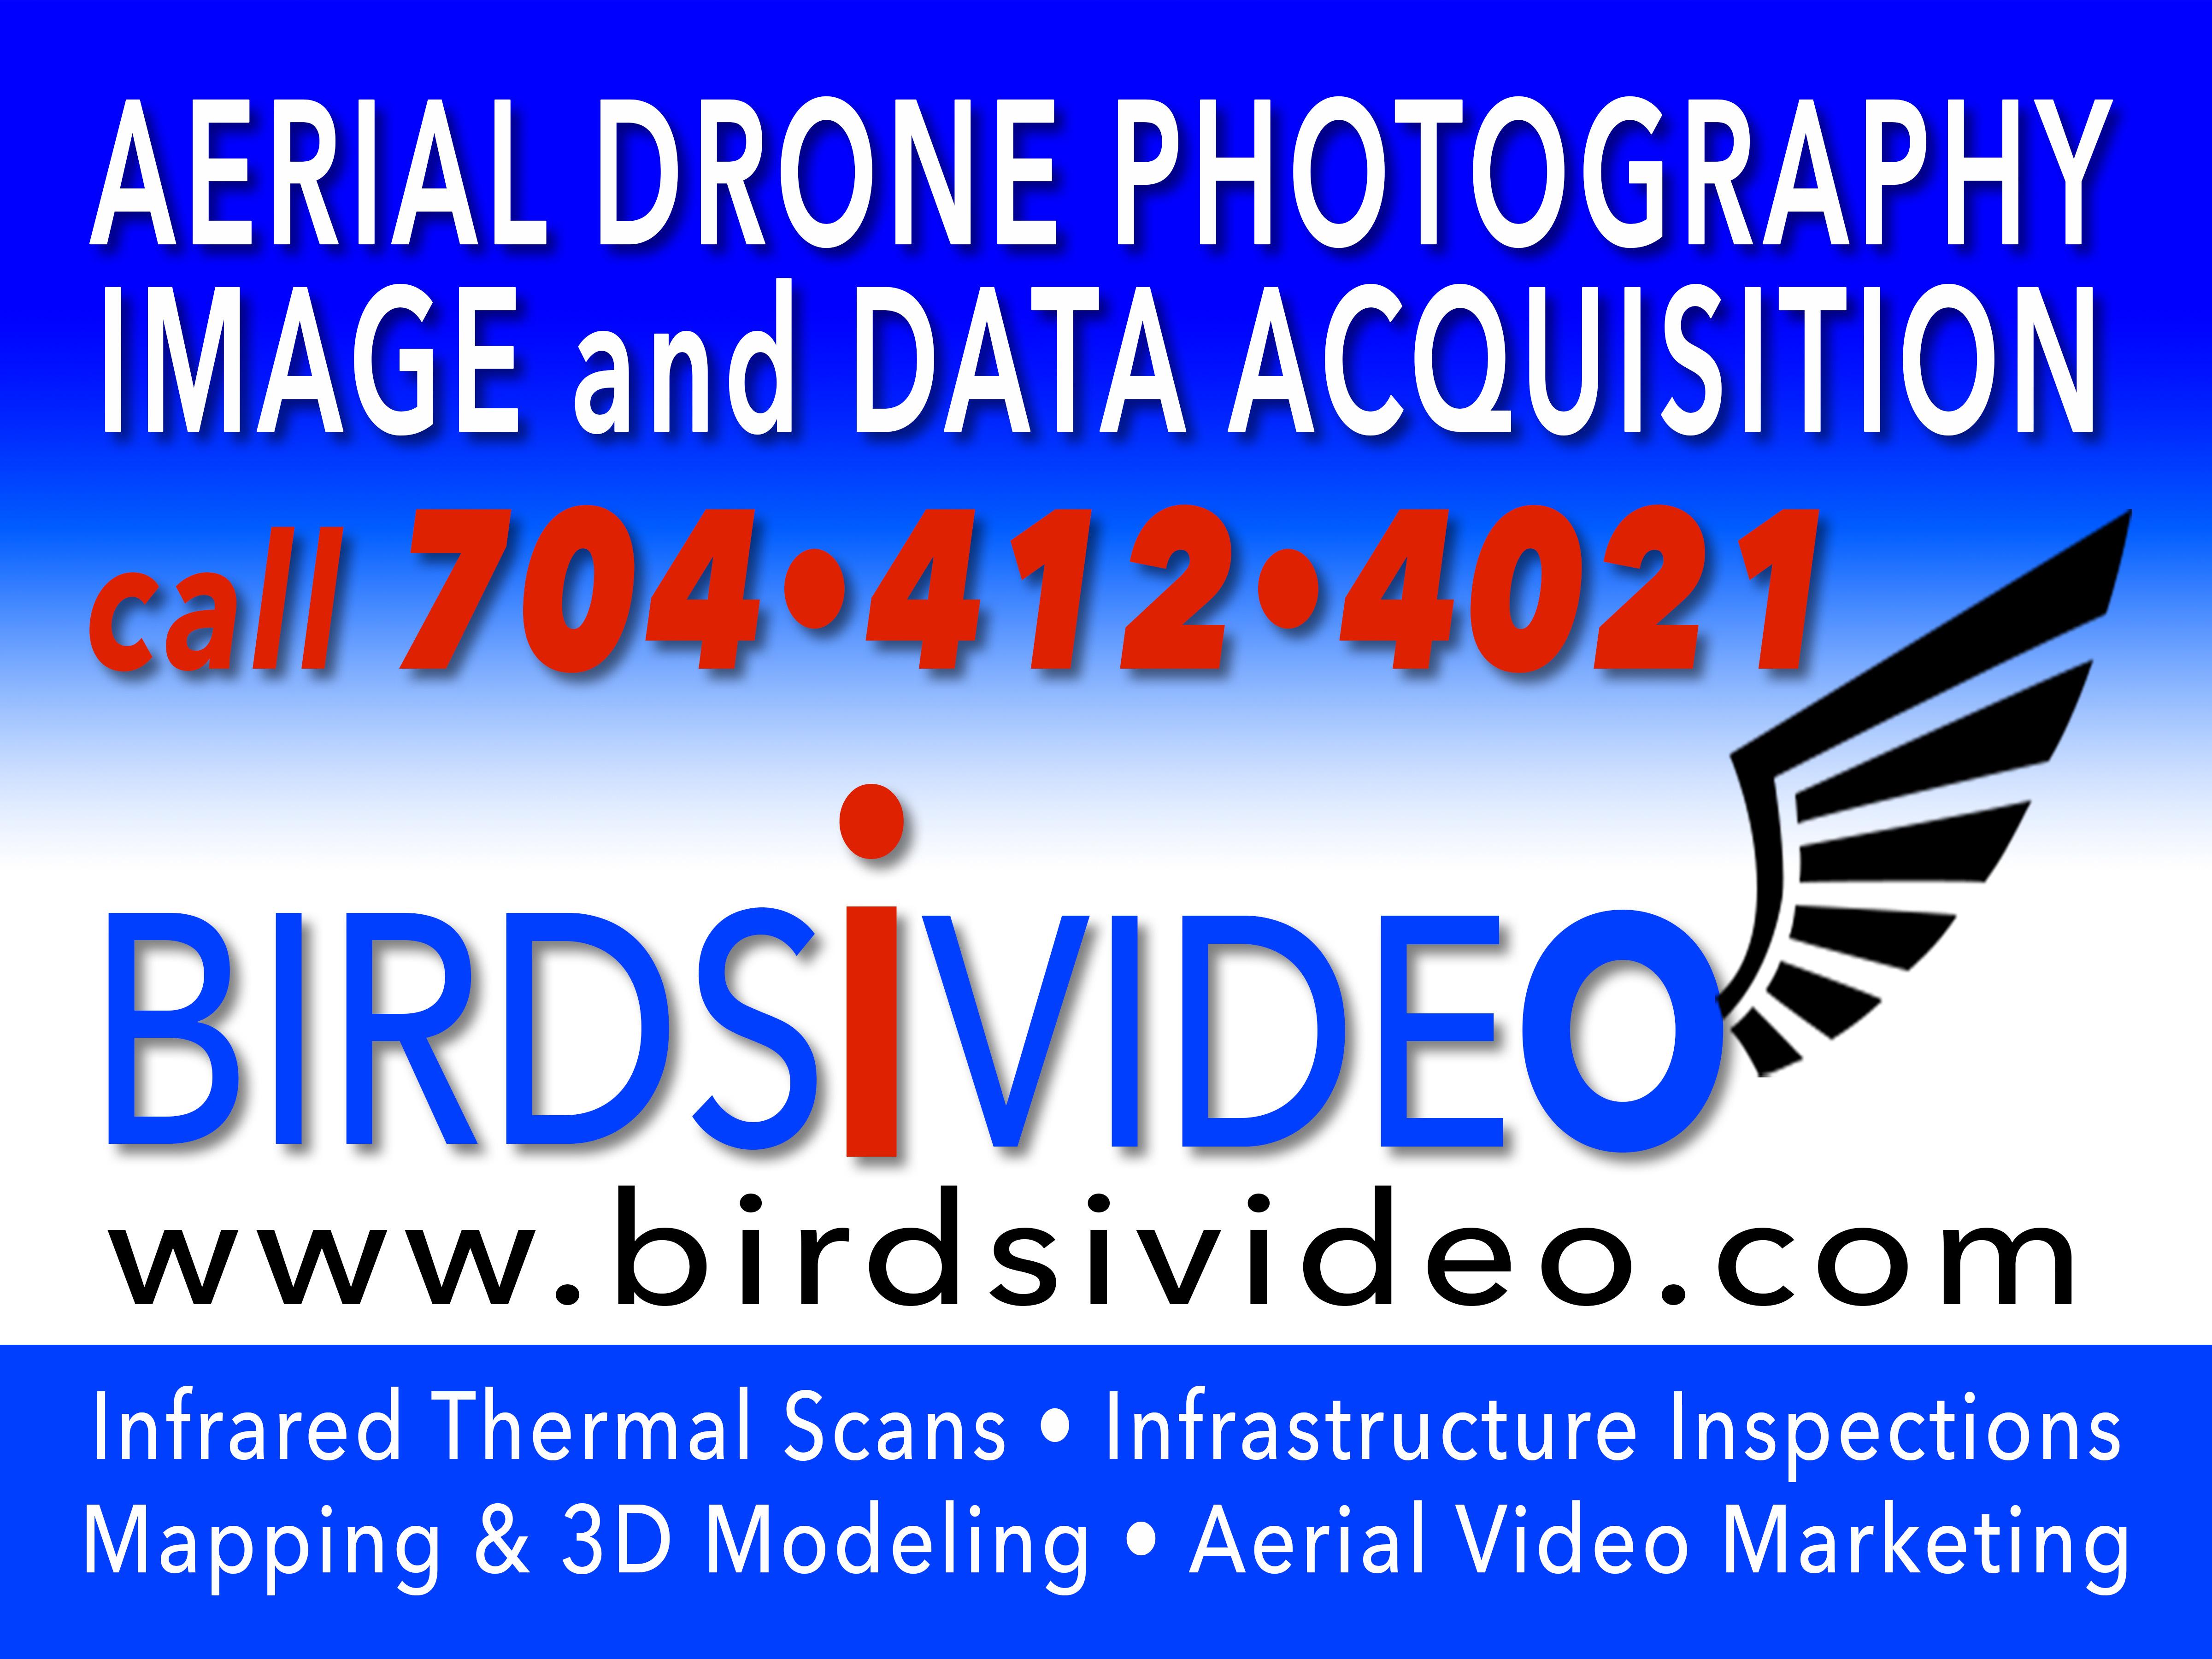 BIRDSiVIDEO Charlotte (Dickson Drone Imagery LLC) image 4